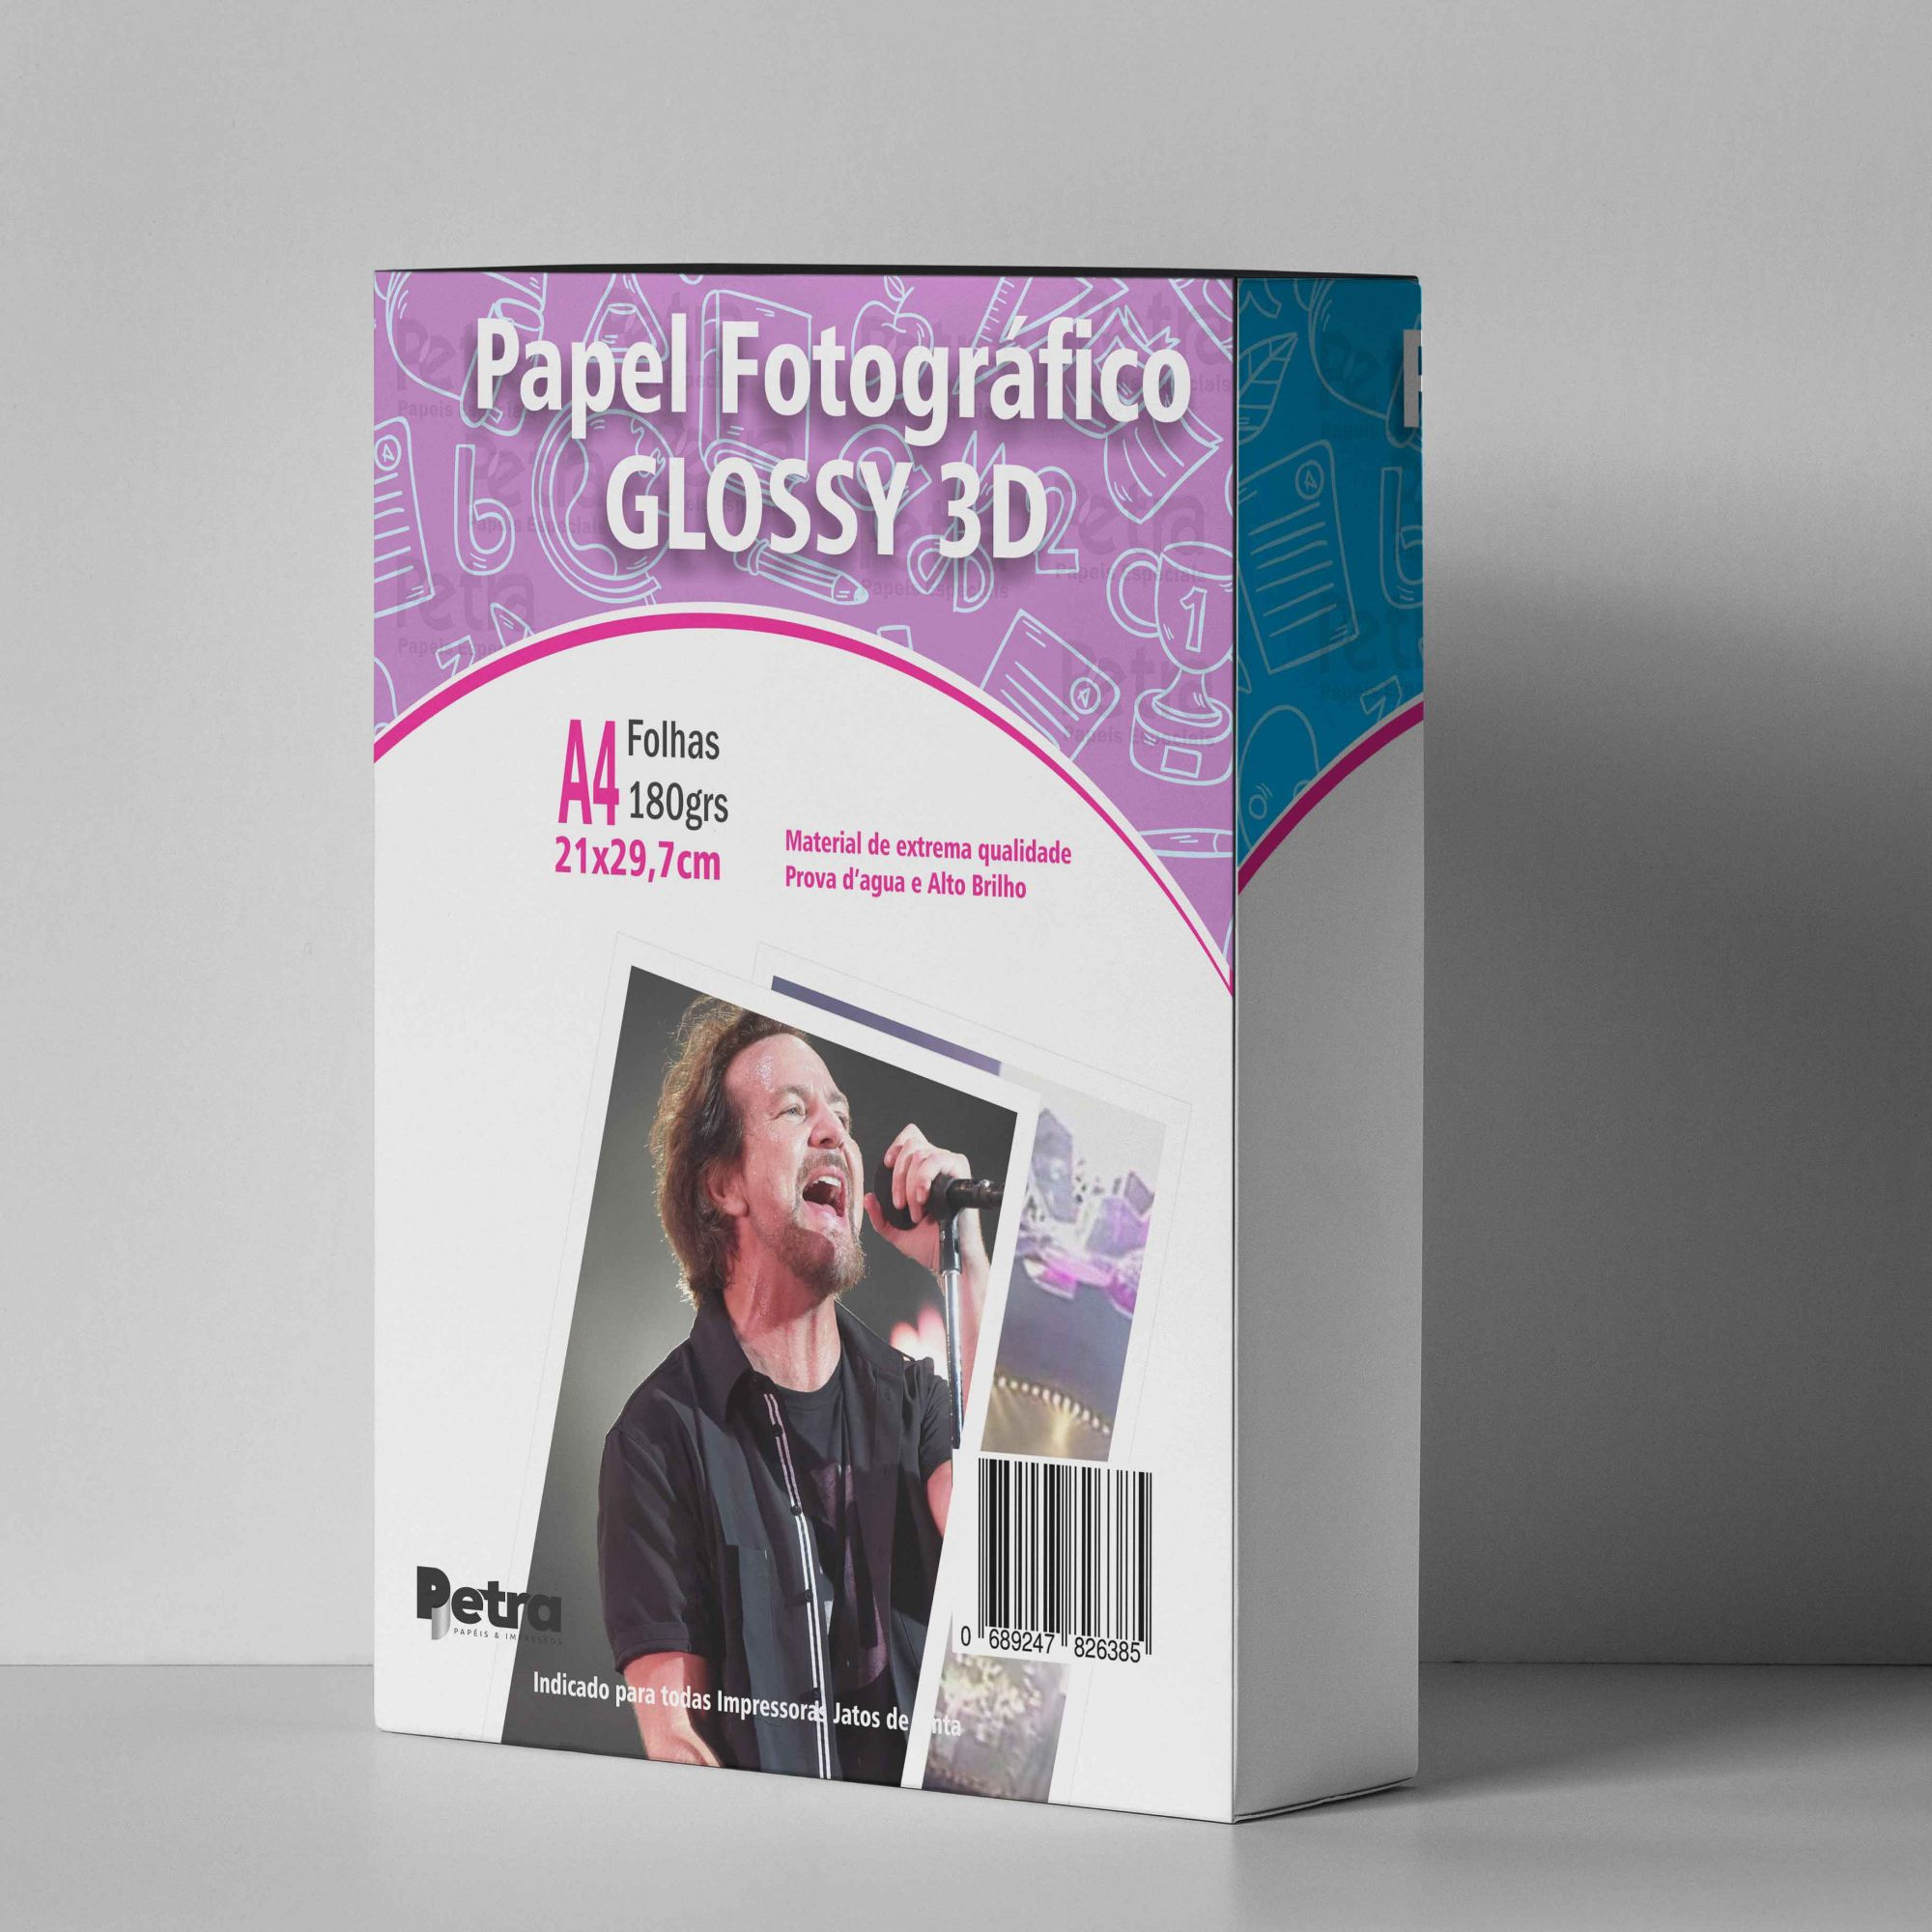 Papel 3D Holográfico Glossy Pontilhado A4 180g - 20 Folhas